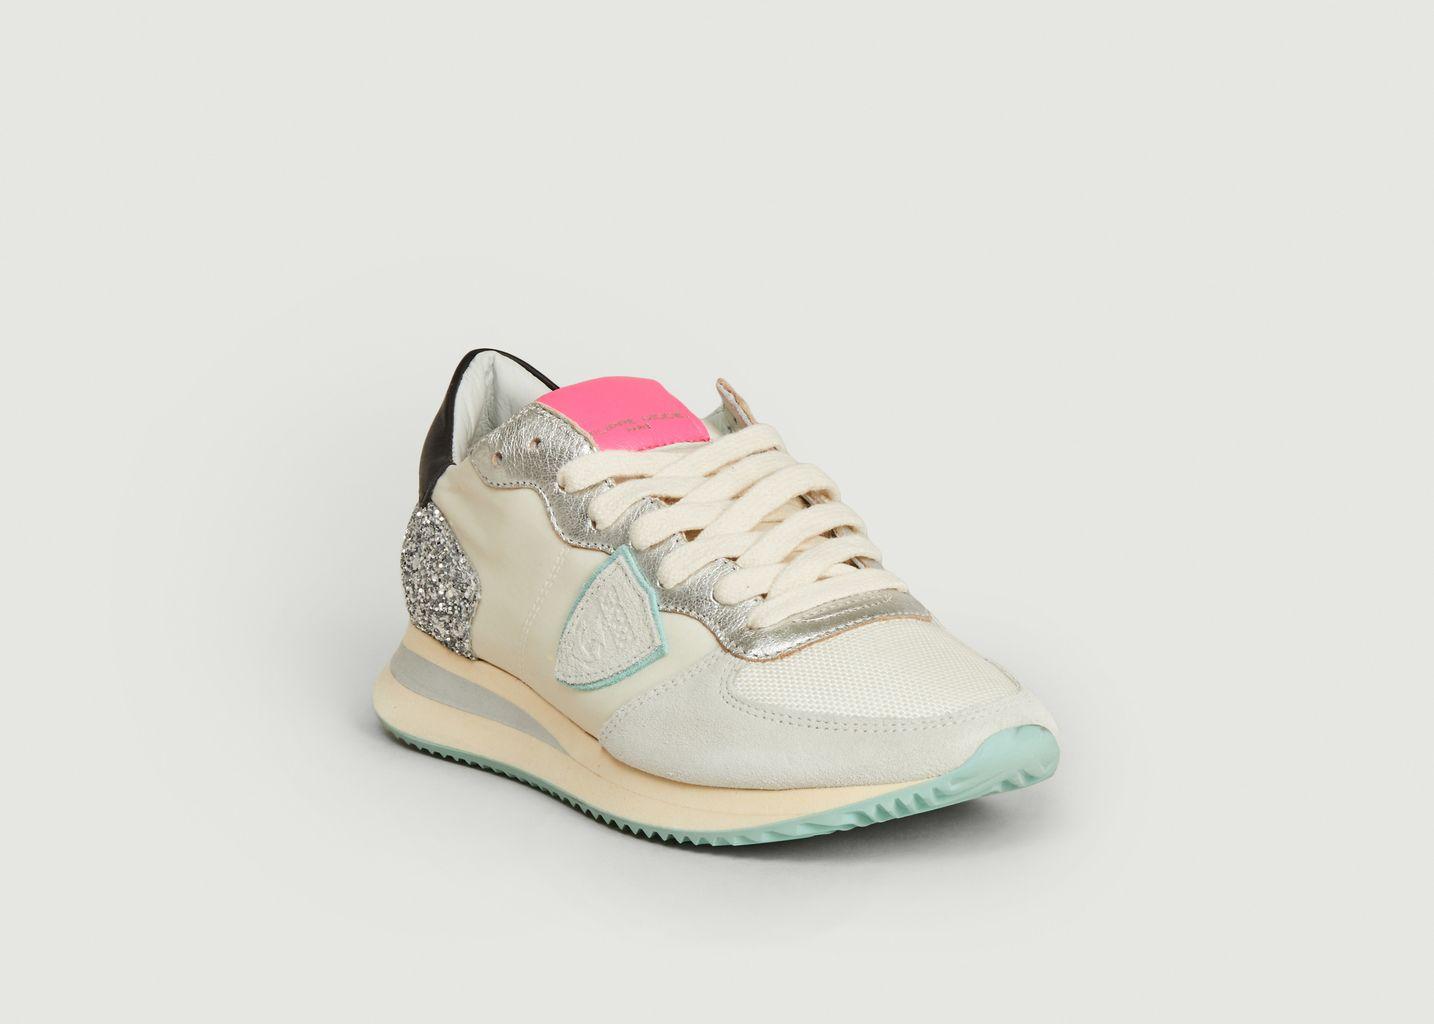 Sneakers de running TRPX Glitter - Philippe Model